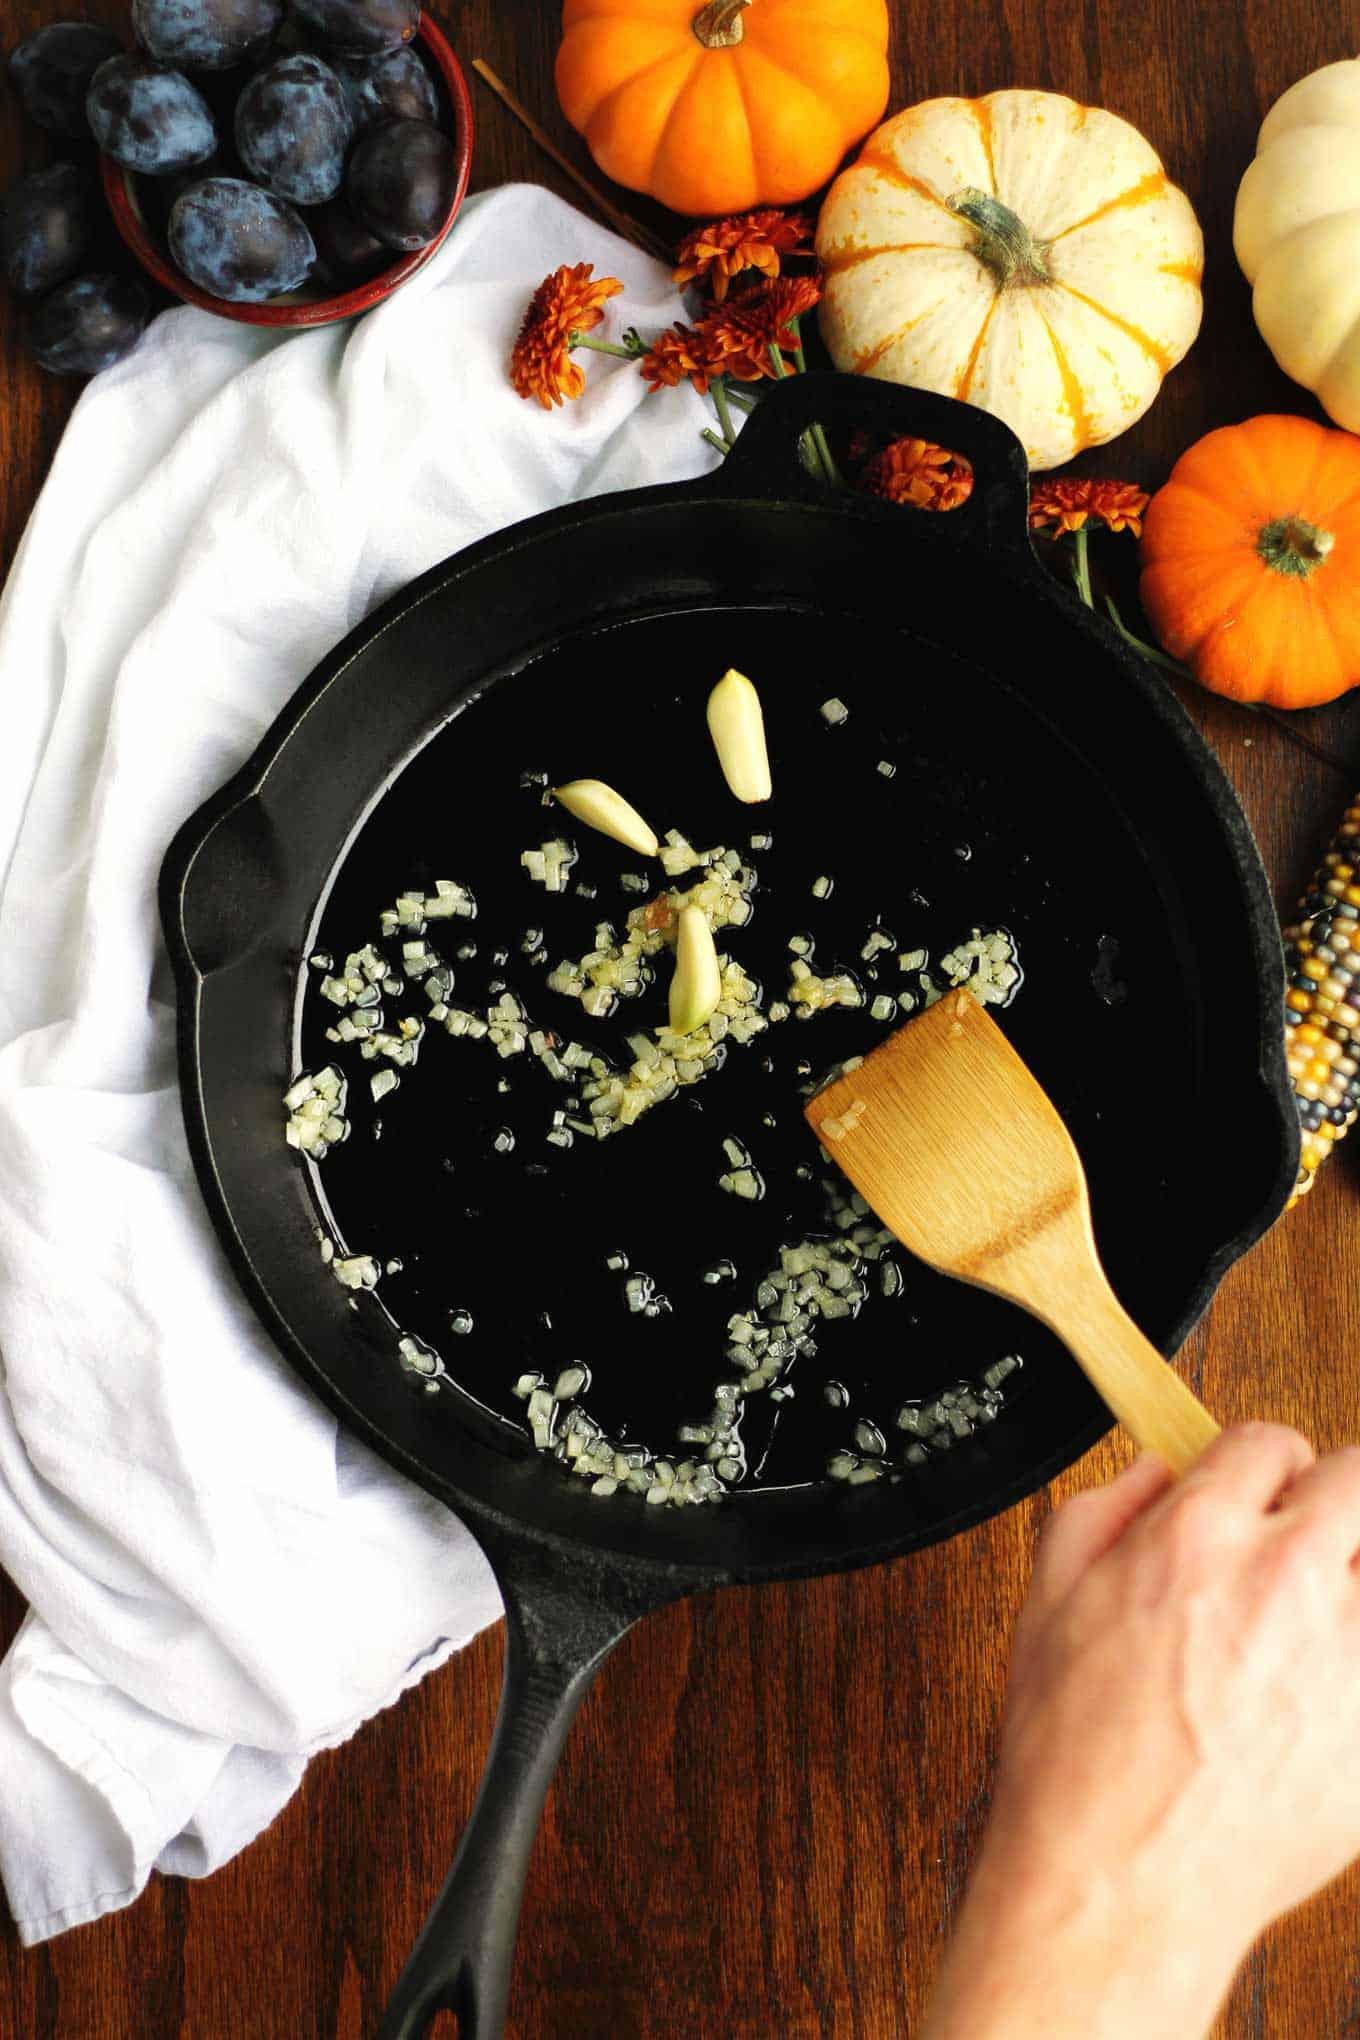 sauteed shallot and garlic in a black skillet